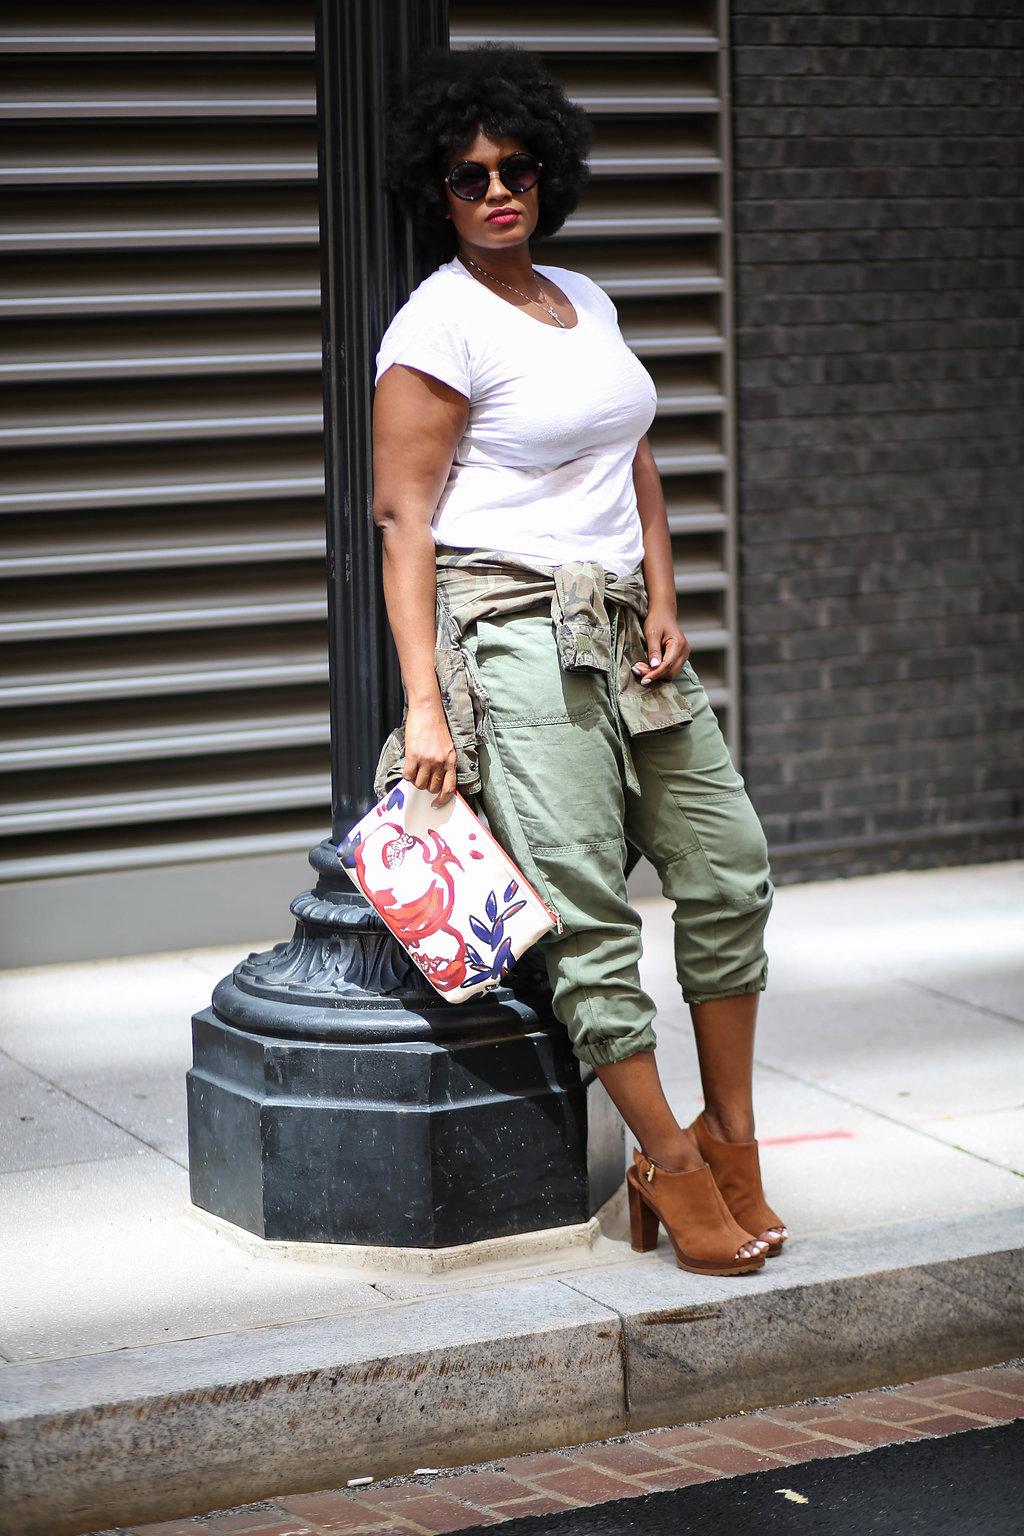 Top Washington, DC Style blogger + natural hair